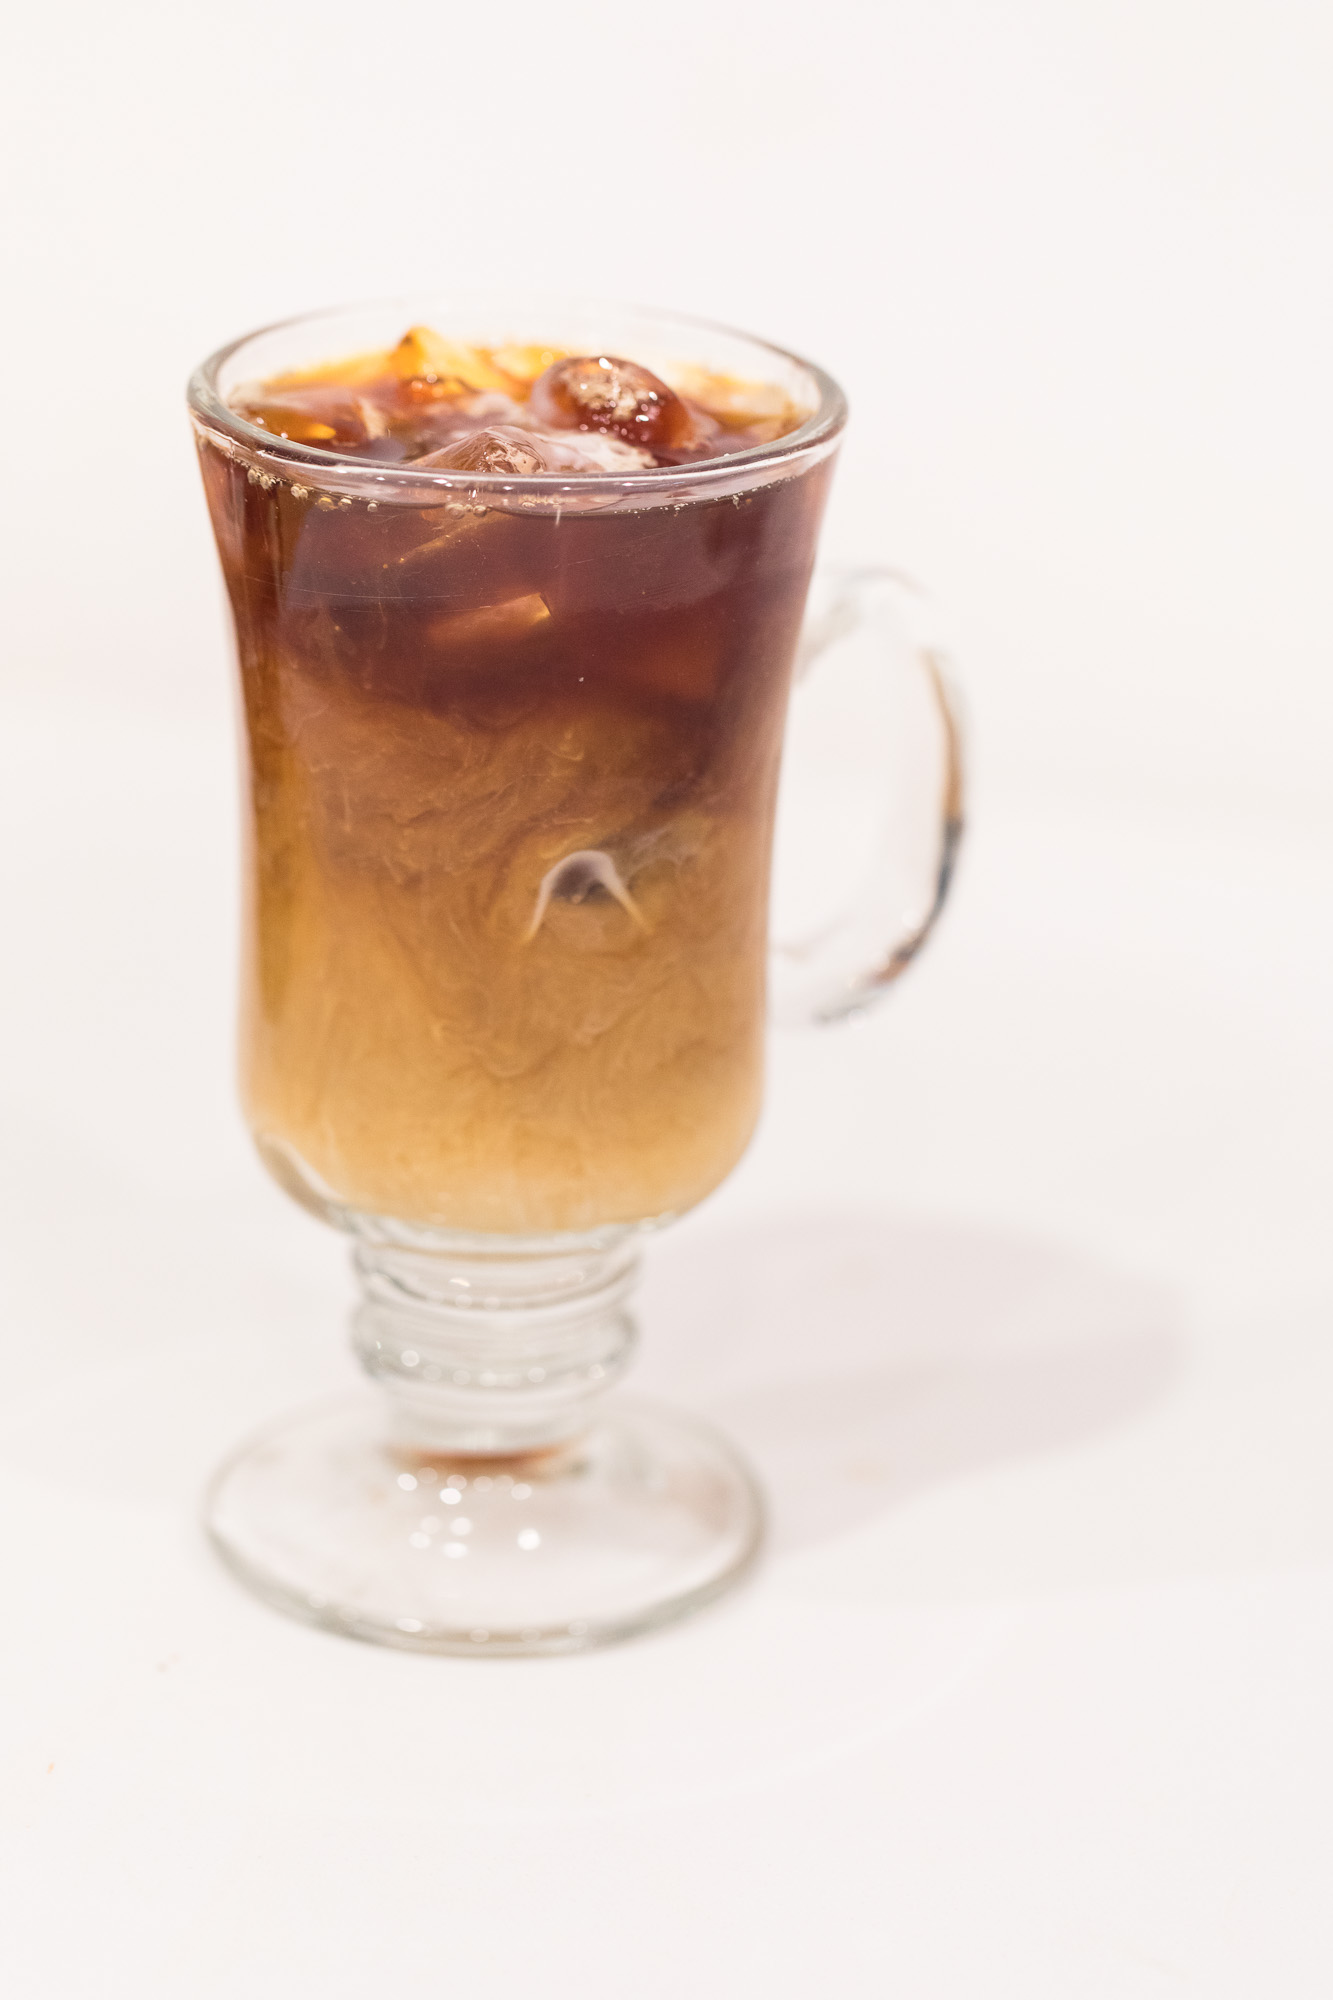 fresh-brewed-coffee-mana-foods-maui.jpg